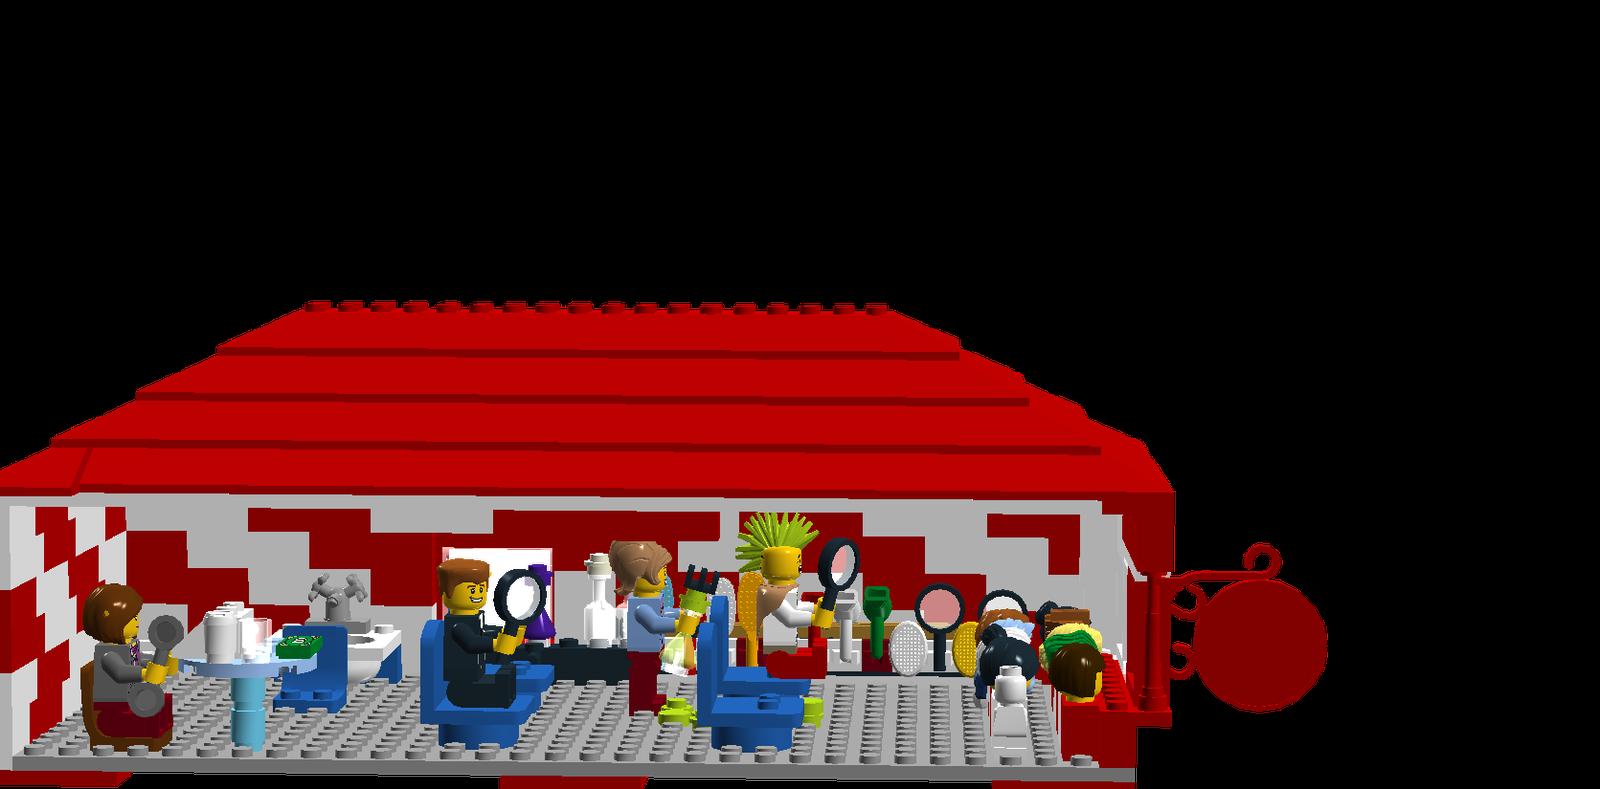 image transparent Building clipart barber shop. Lego ideas product the